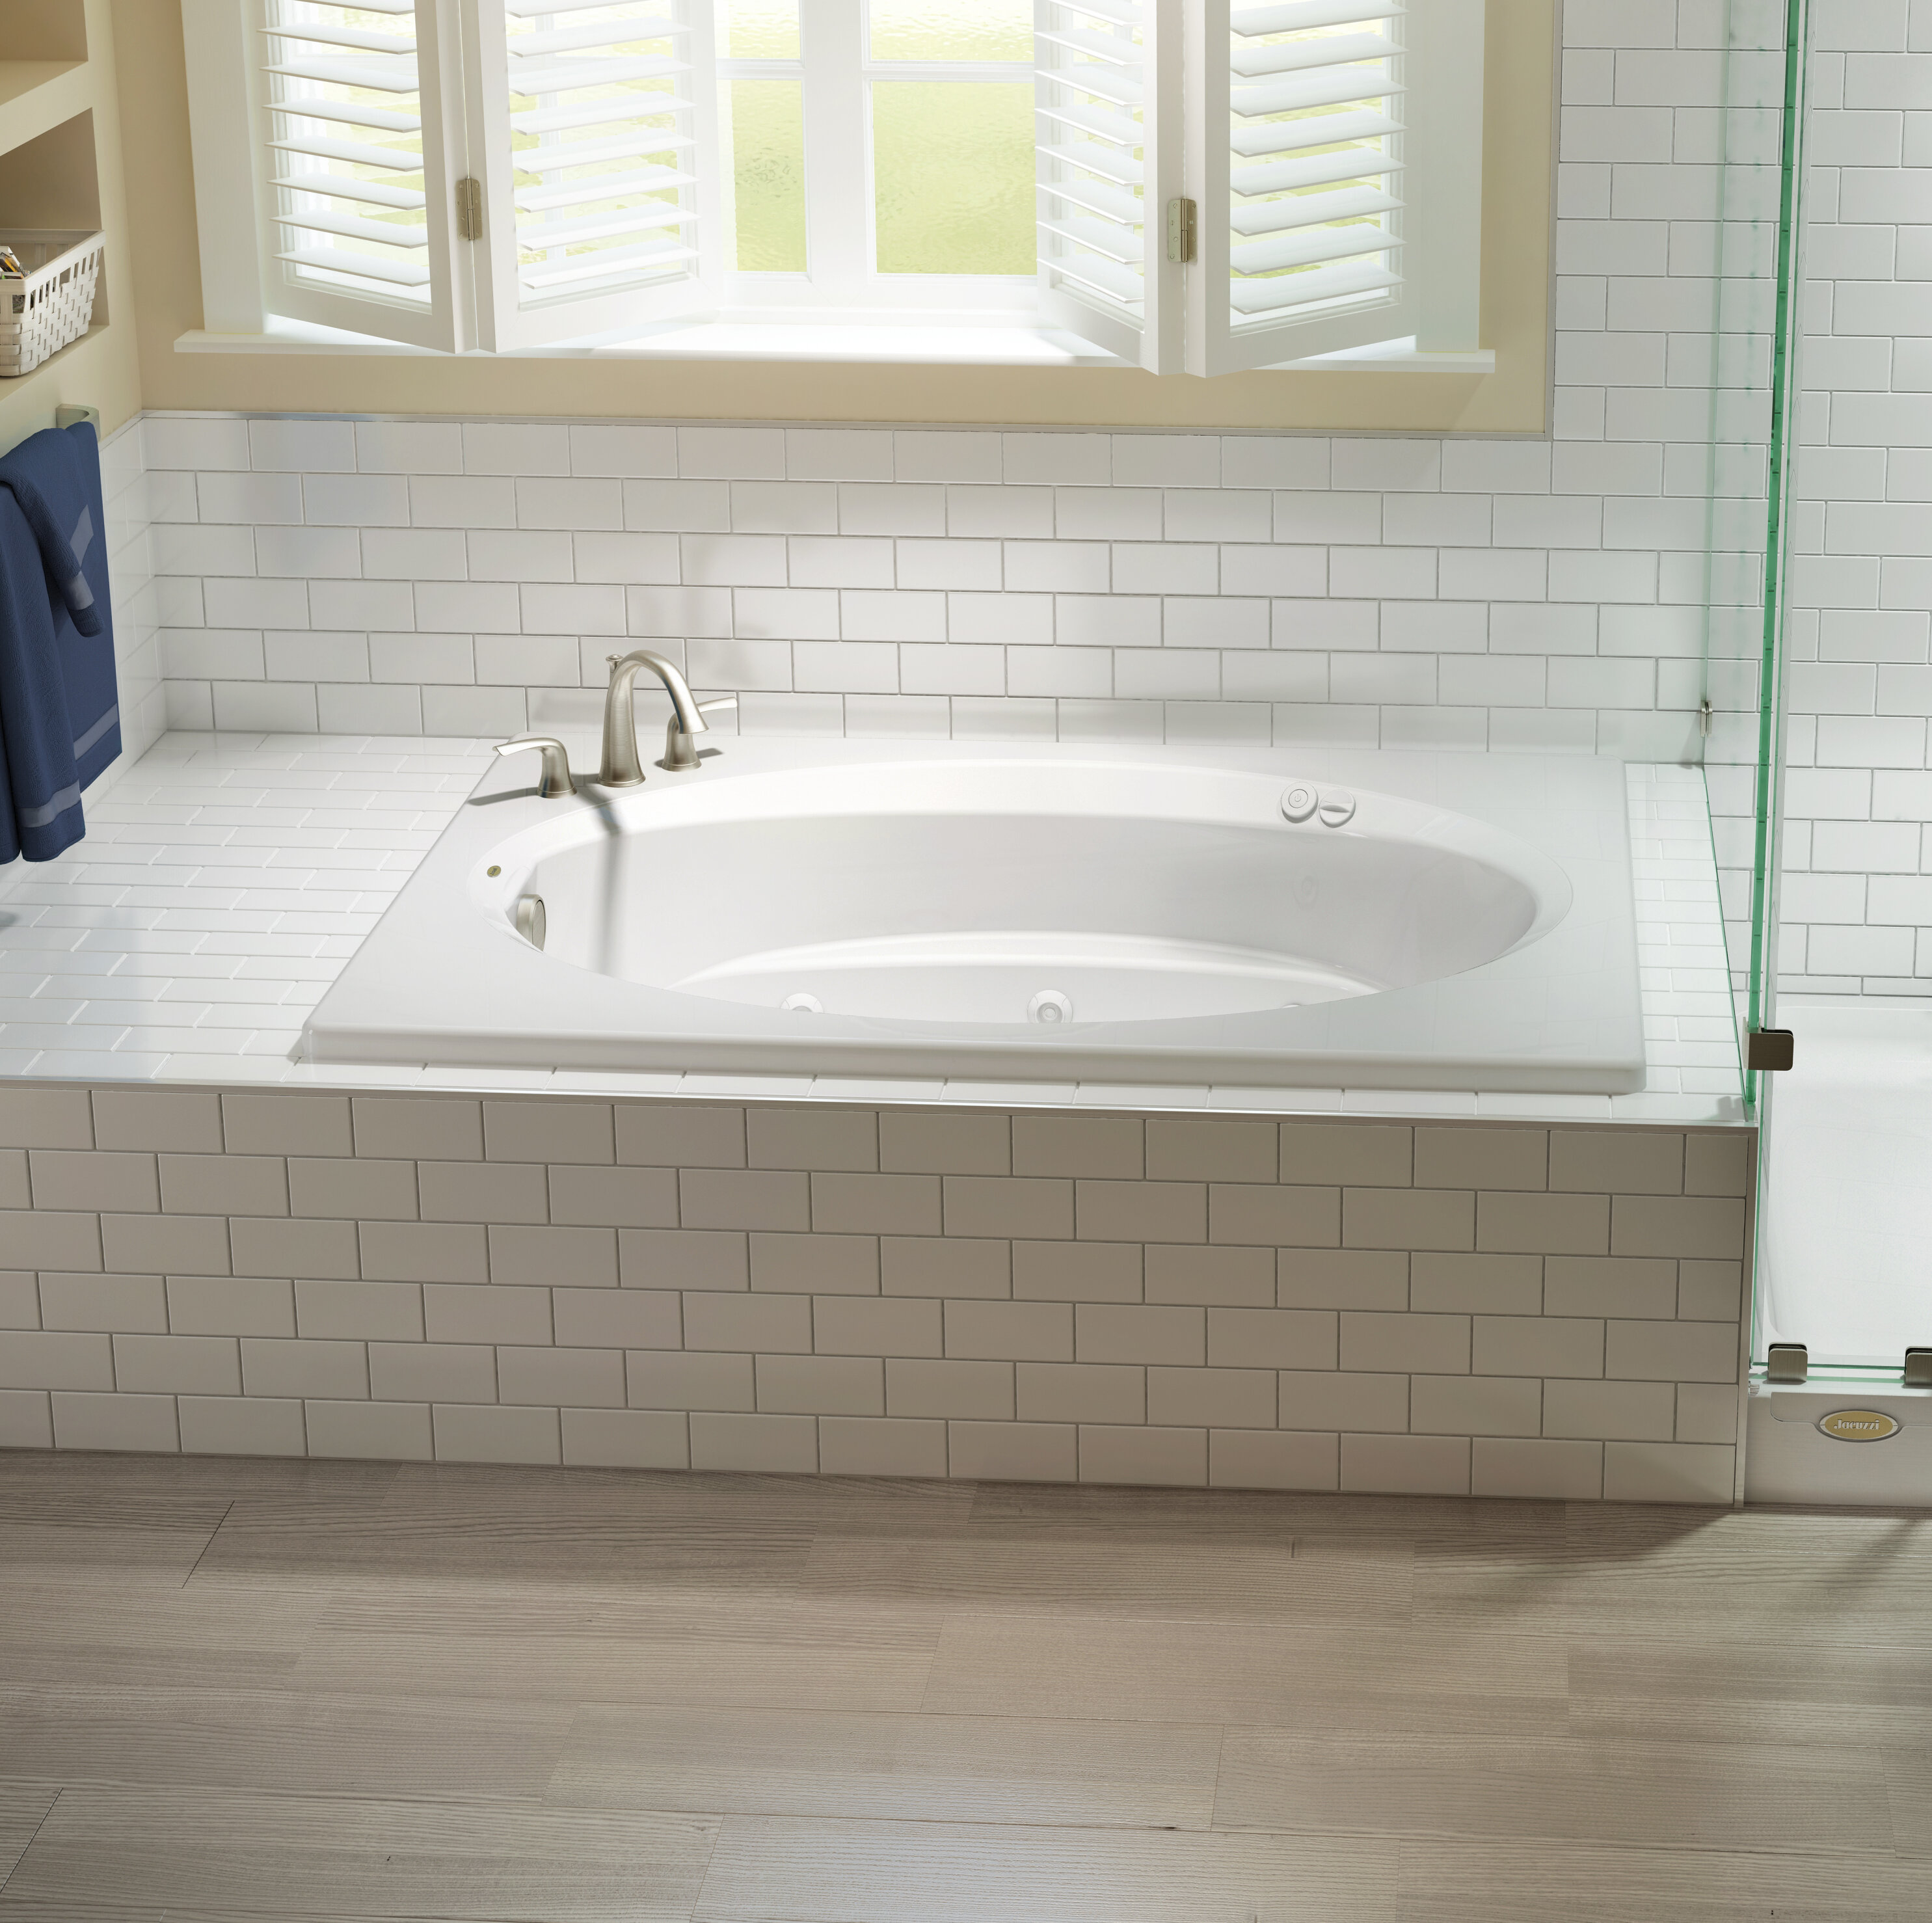 Jacuzzi Whirlpool Bath Jacuzzi.Signature 72 X 42 Drop In Whirlpool Bathtub